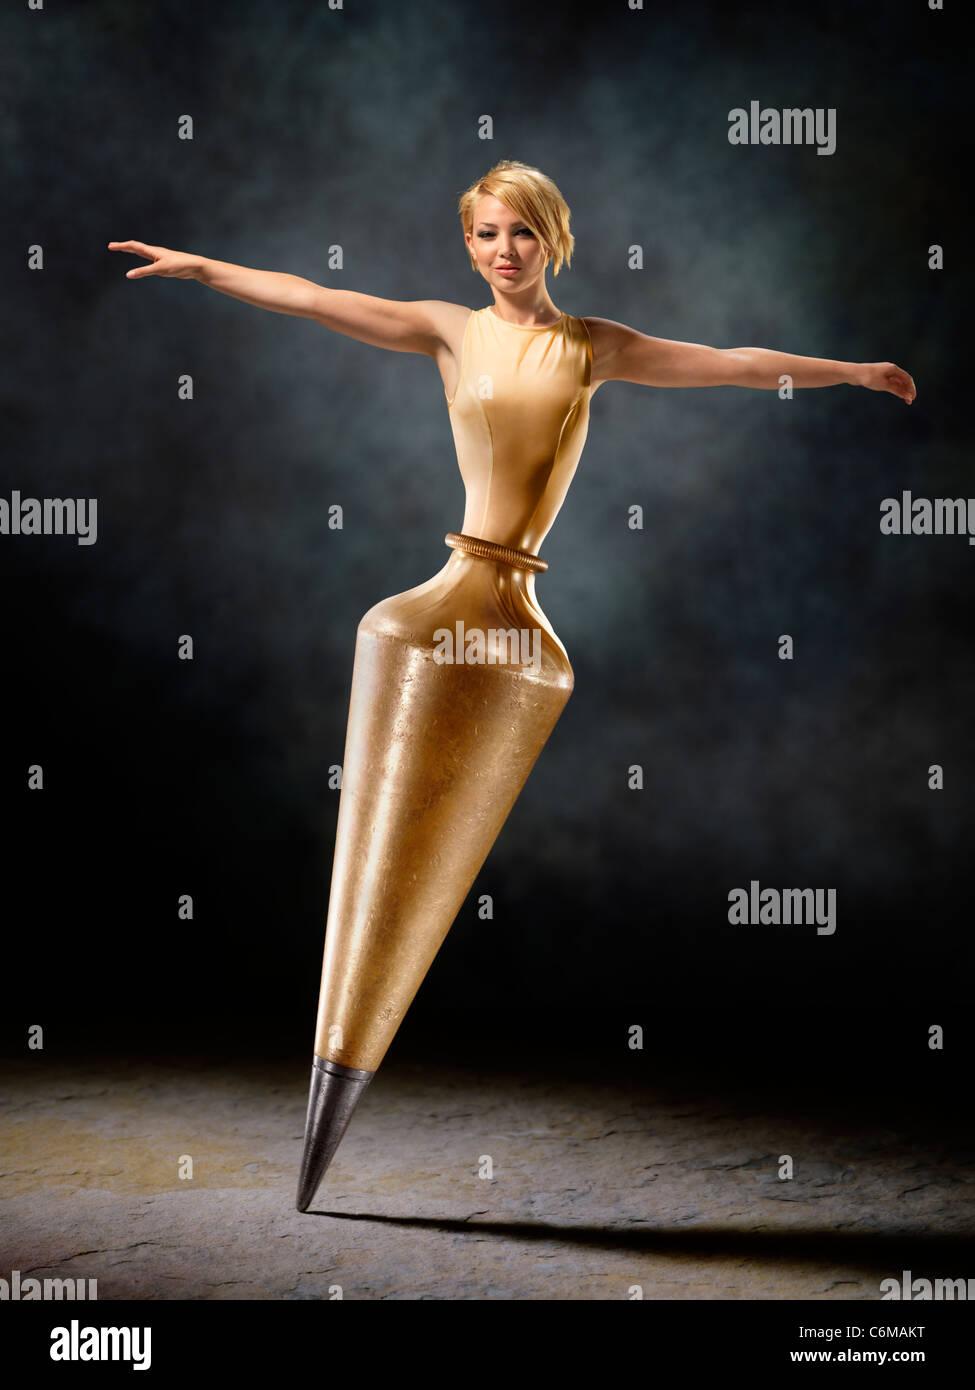 fantasy image of woman dancer morphing into brass plumb bob Stock Photo